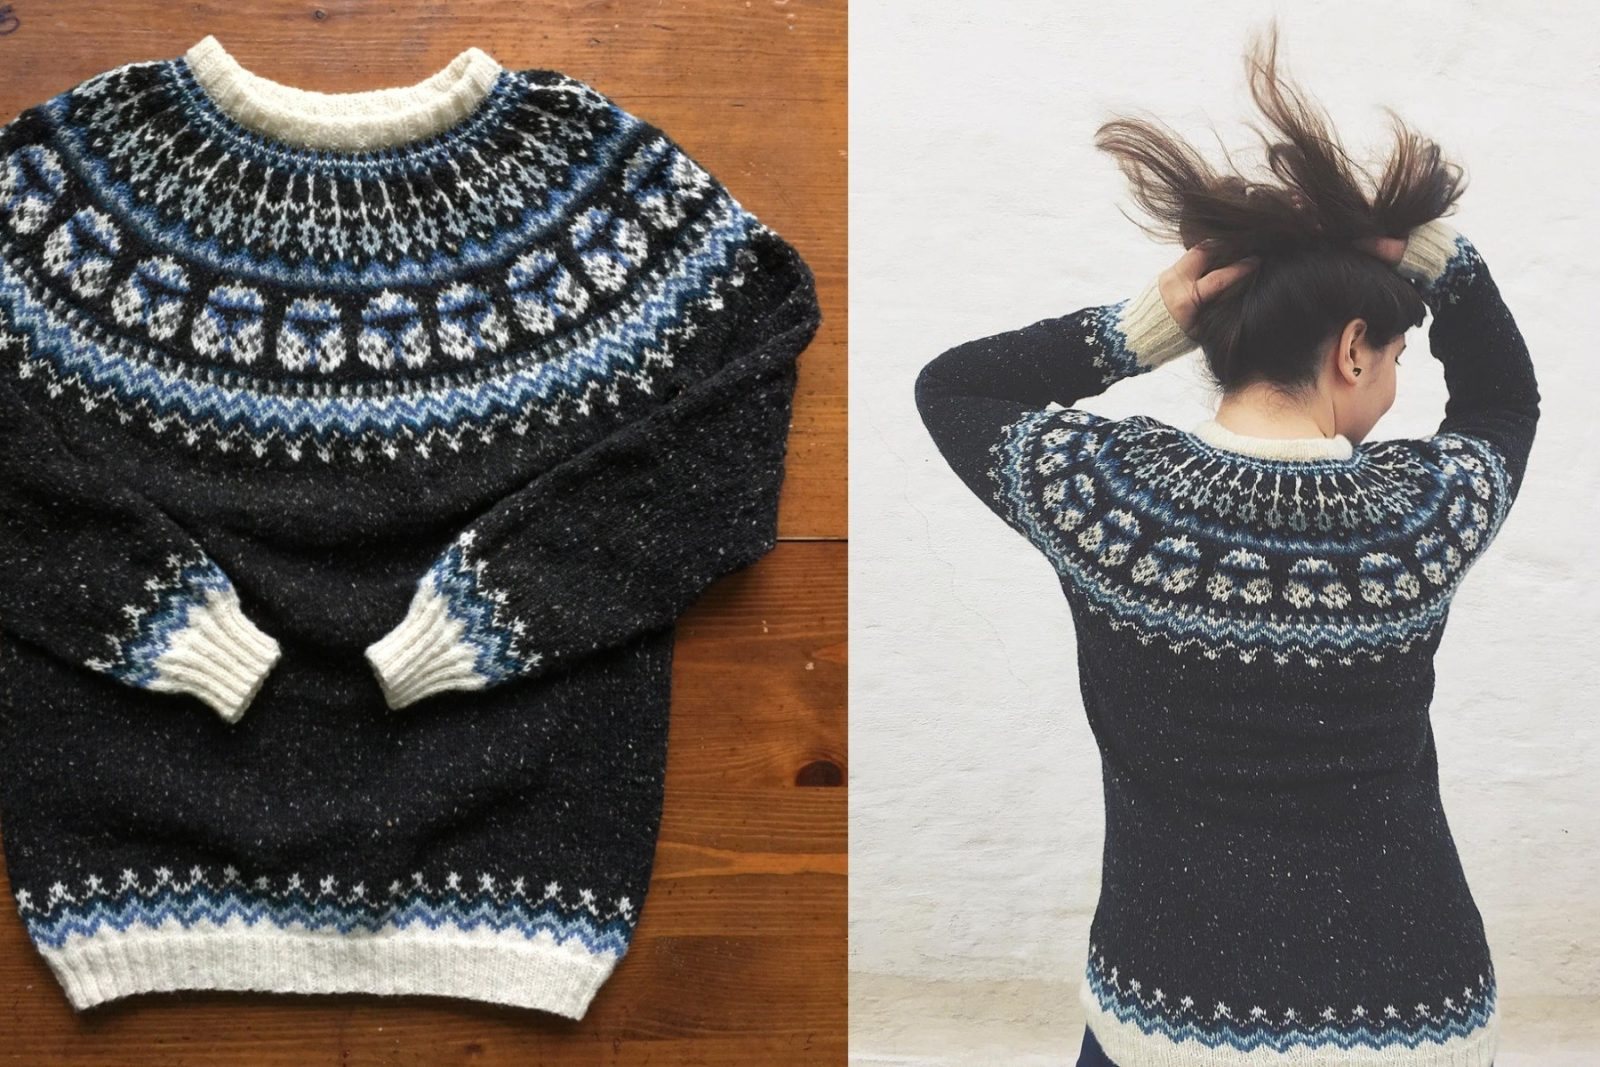 Star Wars sweaters by Natela Datura Design